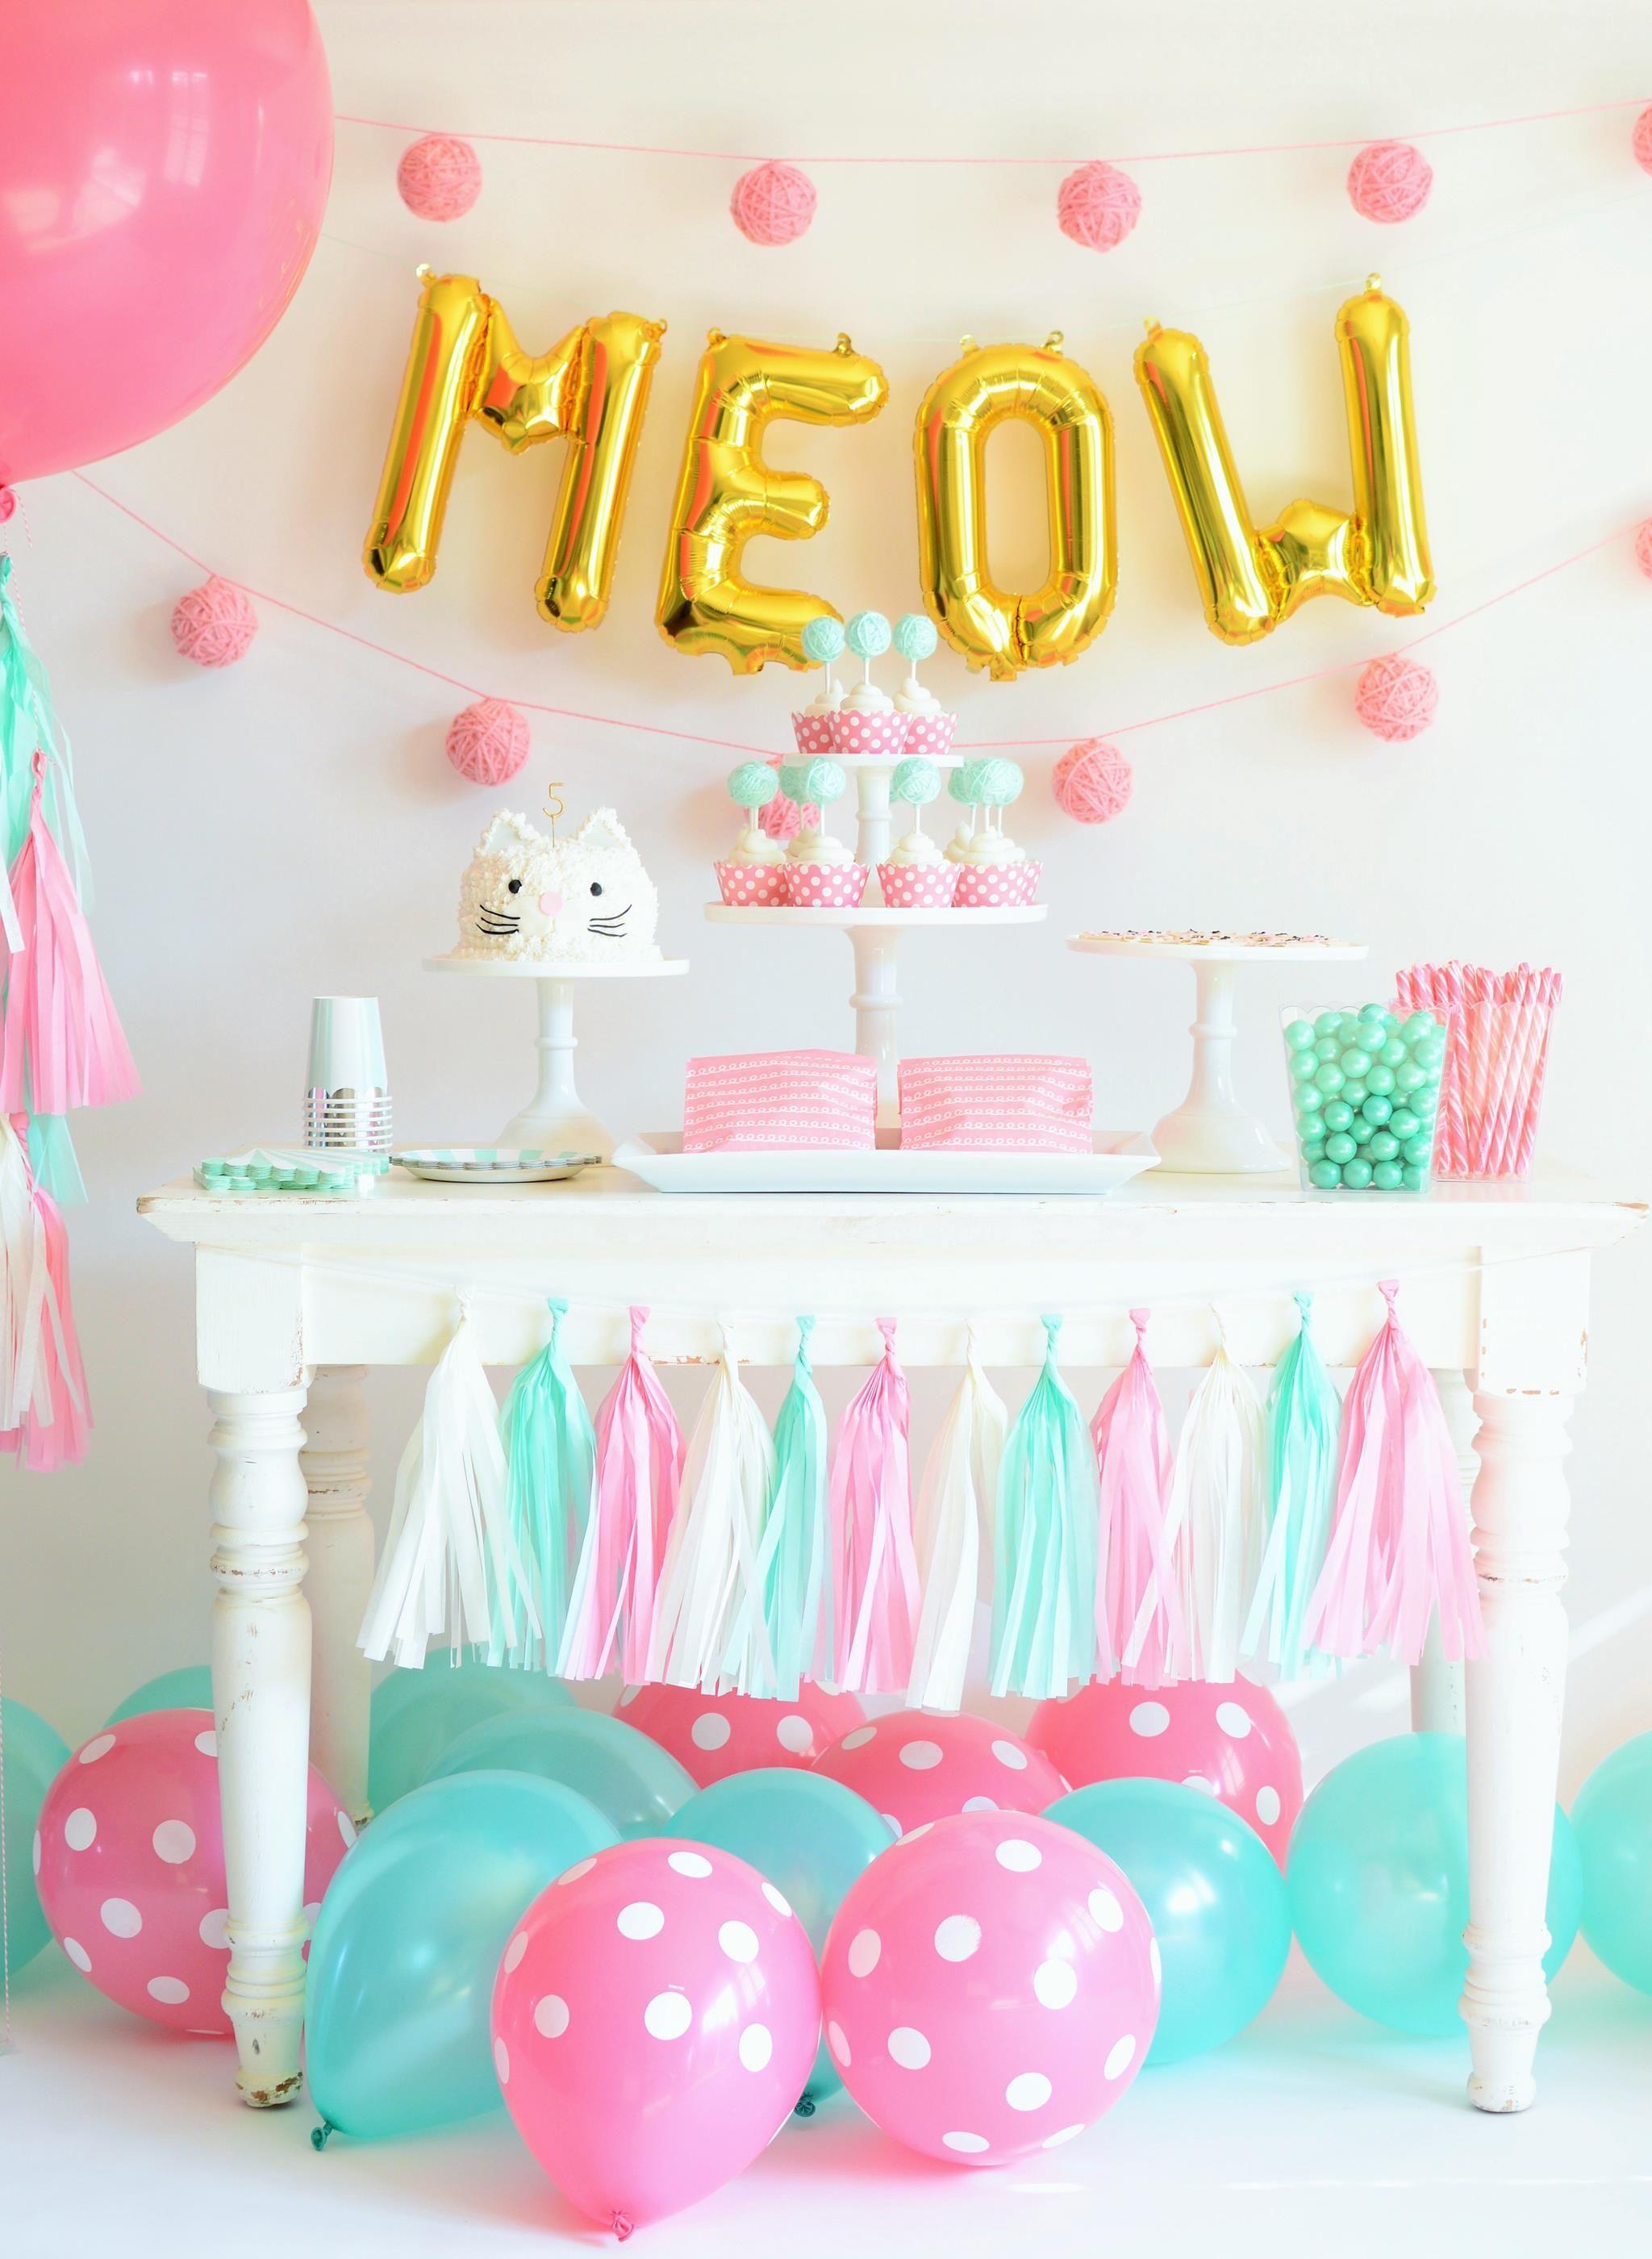 Pastel Colored Kitten Birthday Party Theme Decor